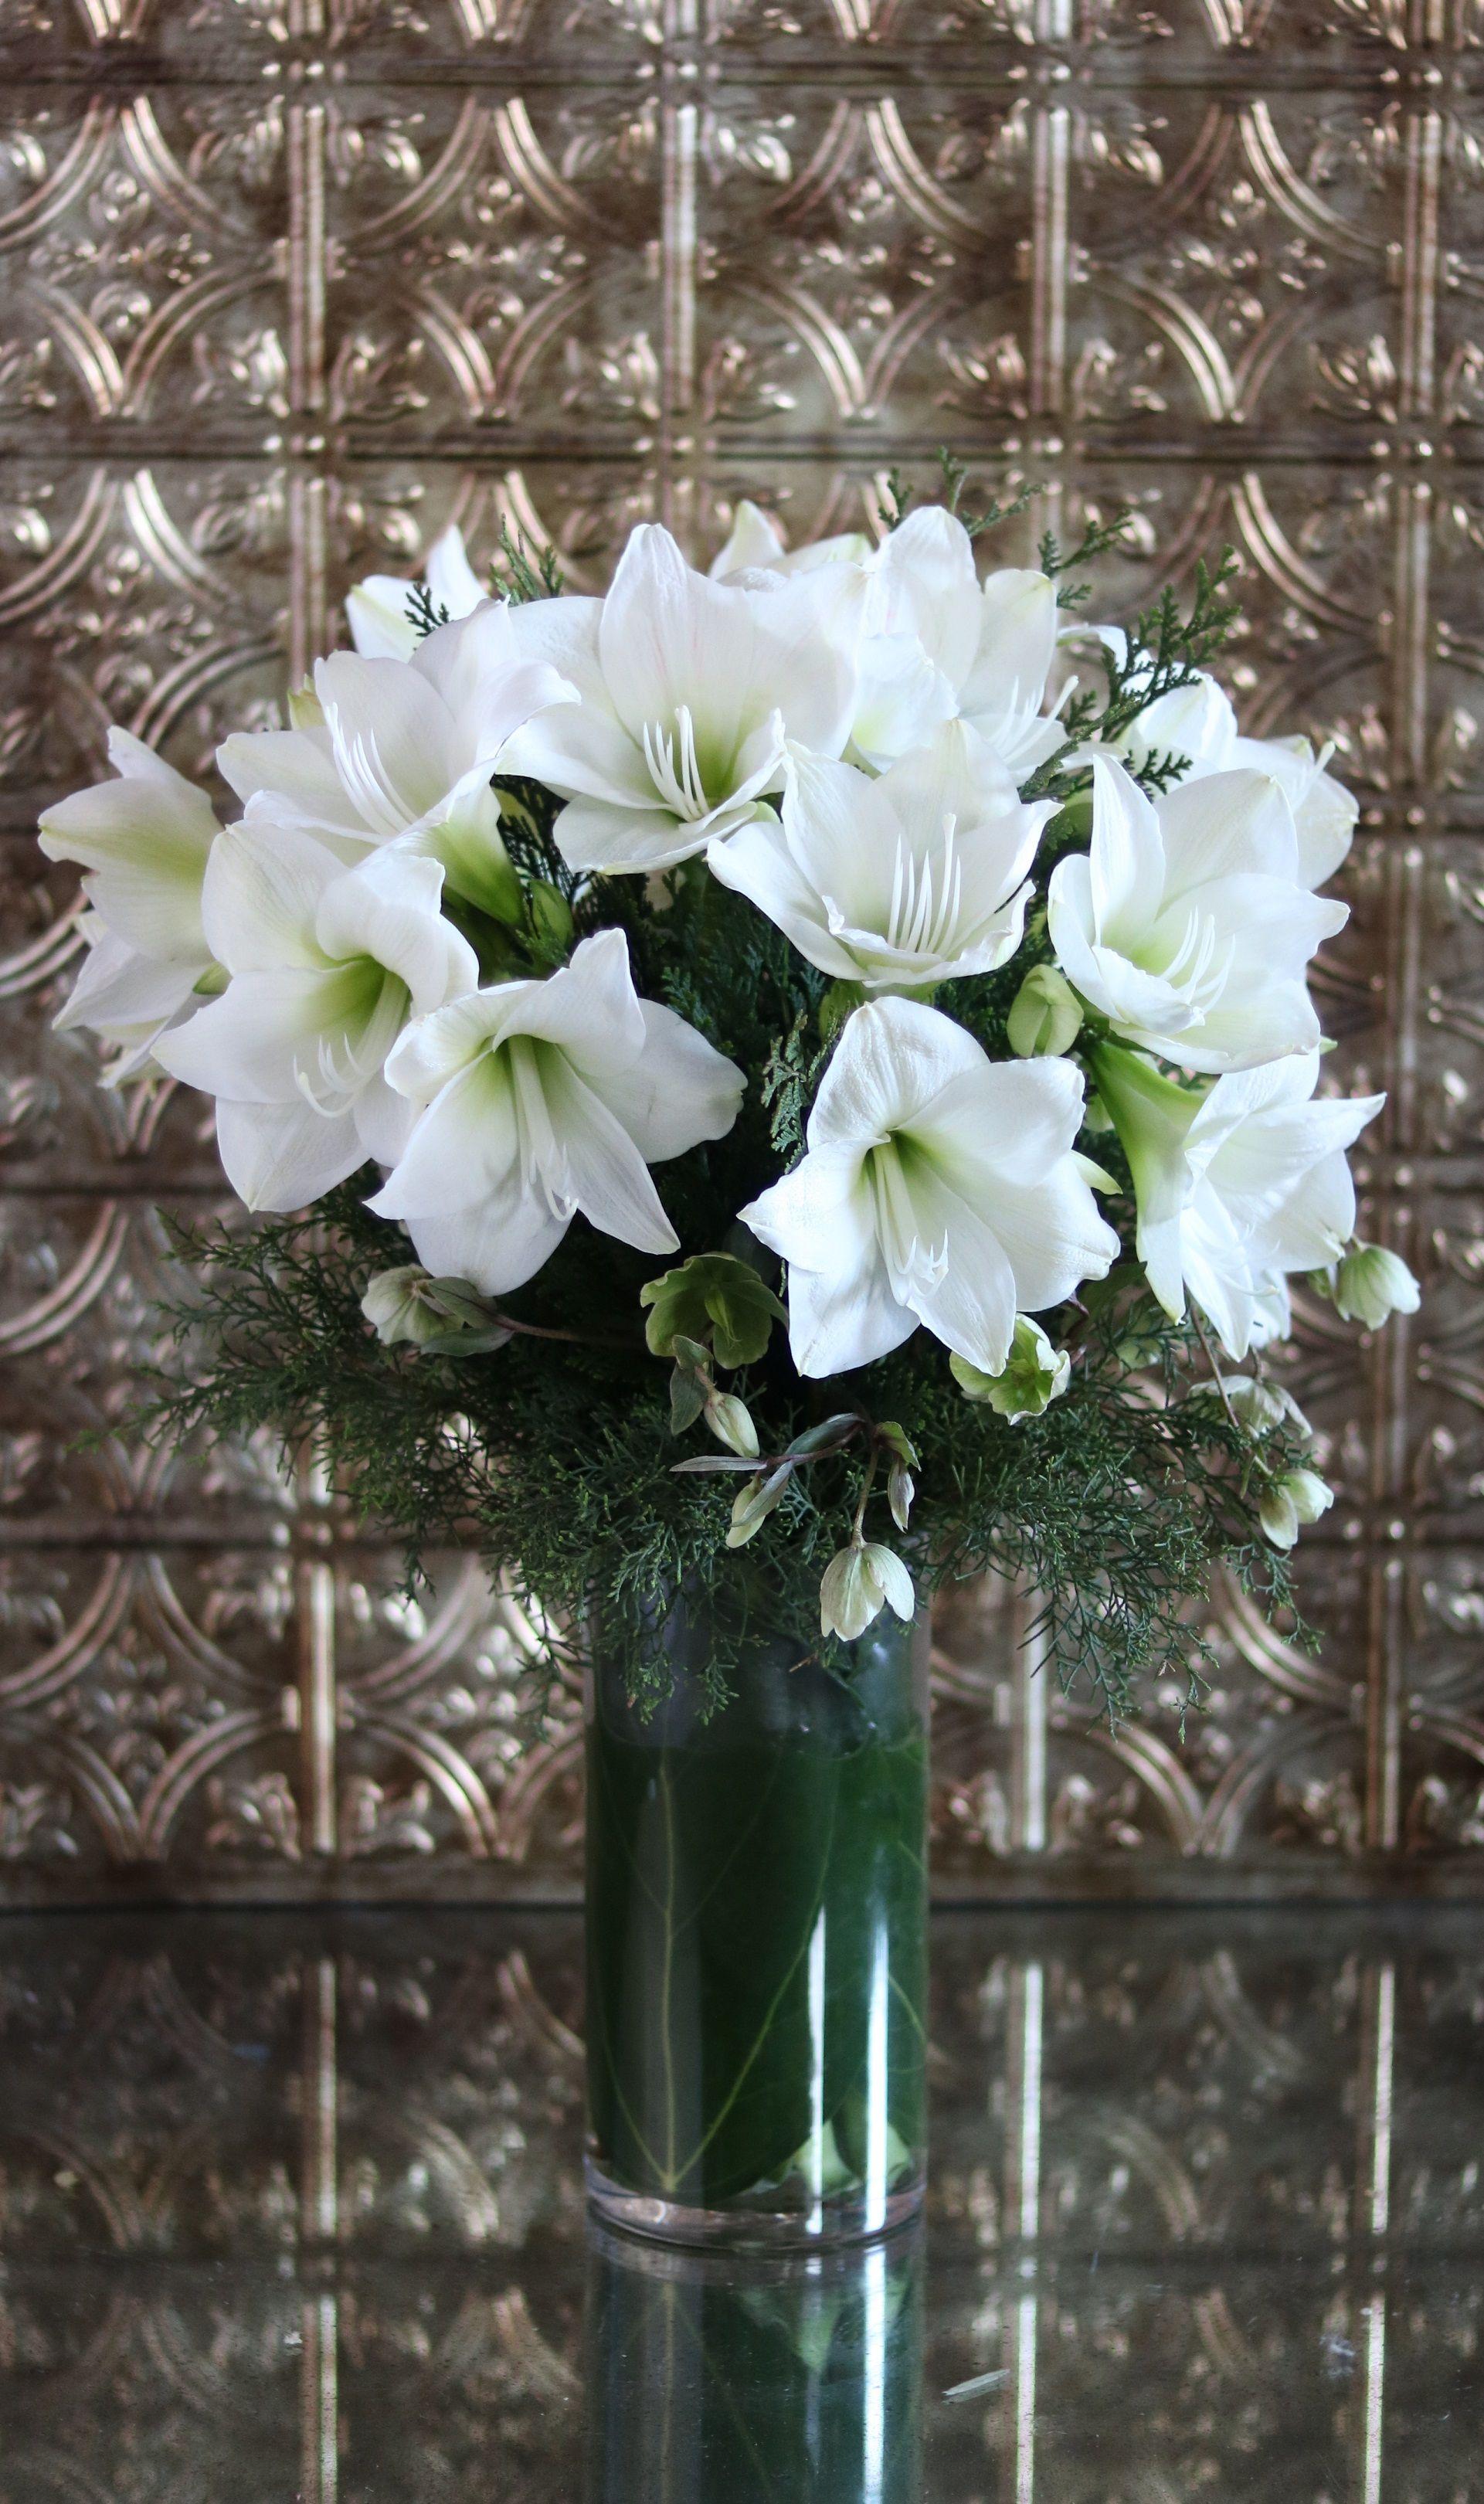 Full White Amaryllis Blossoms With Conifer Greens Amaryllis Joy By Winston Flower Beautiful Flower Arrangements Same Day Flower Delivery Flower Arrangements